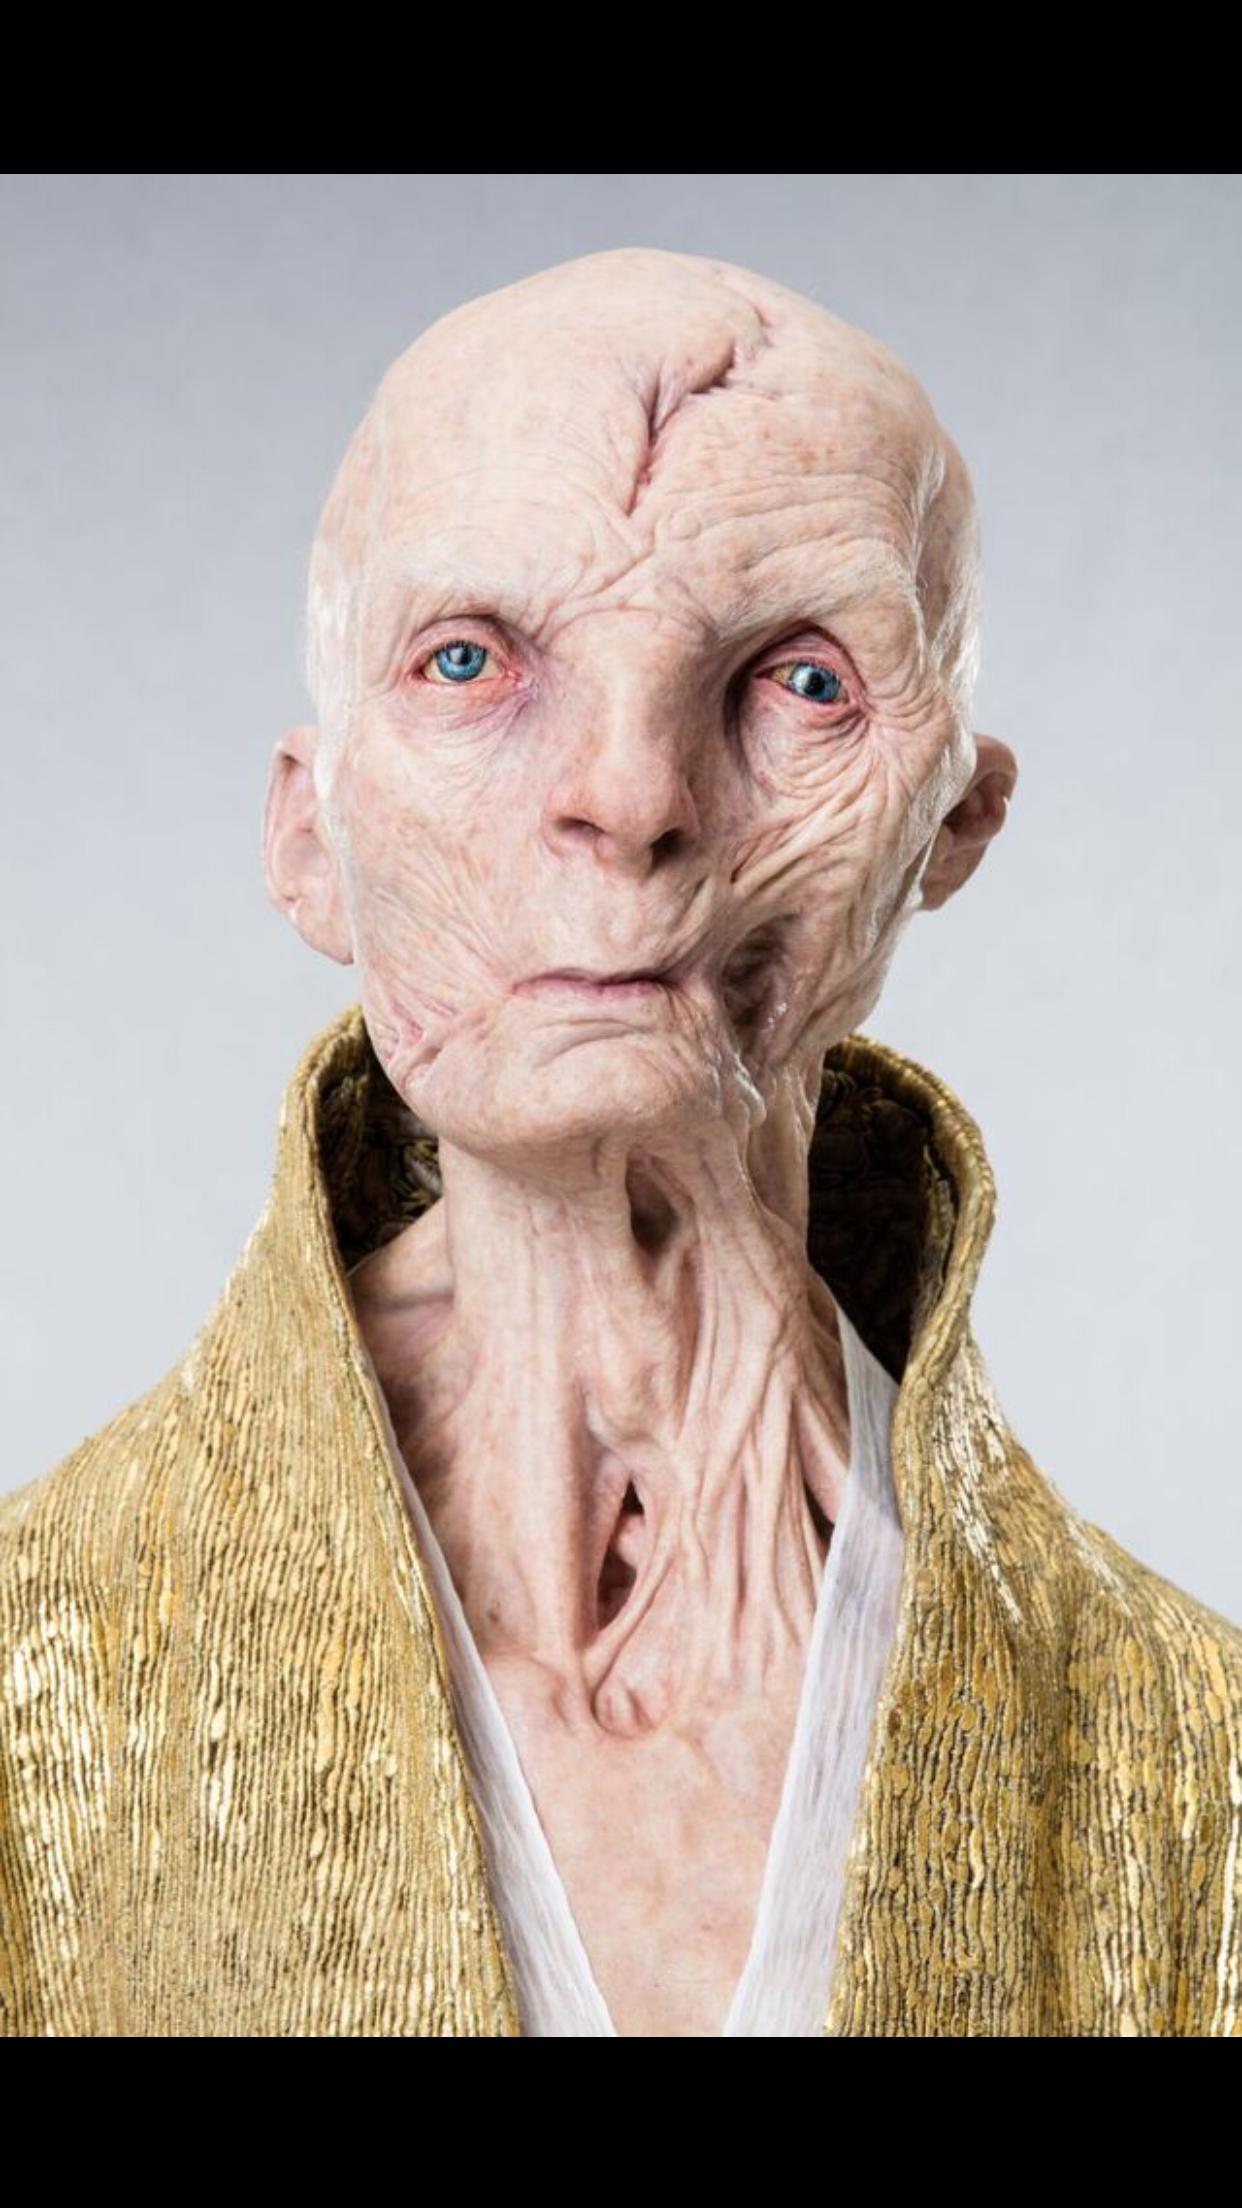 Star Wars The Last Jedi  Leaked Photo Of Supreme